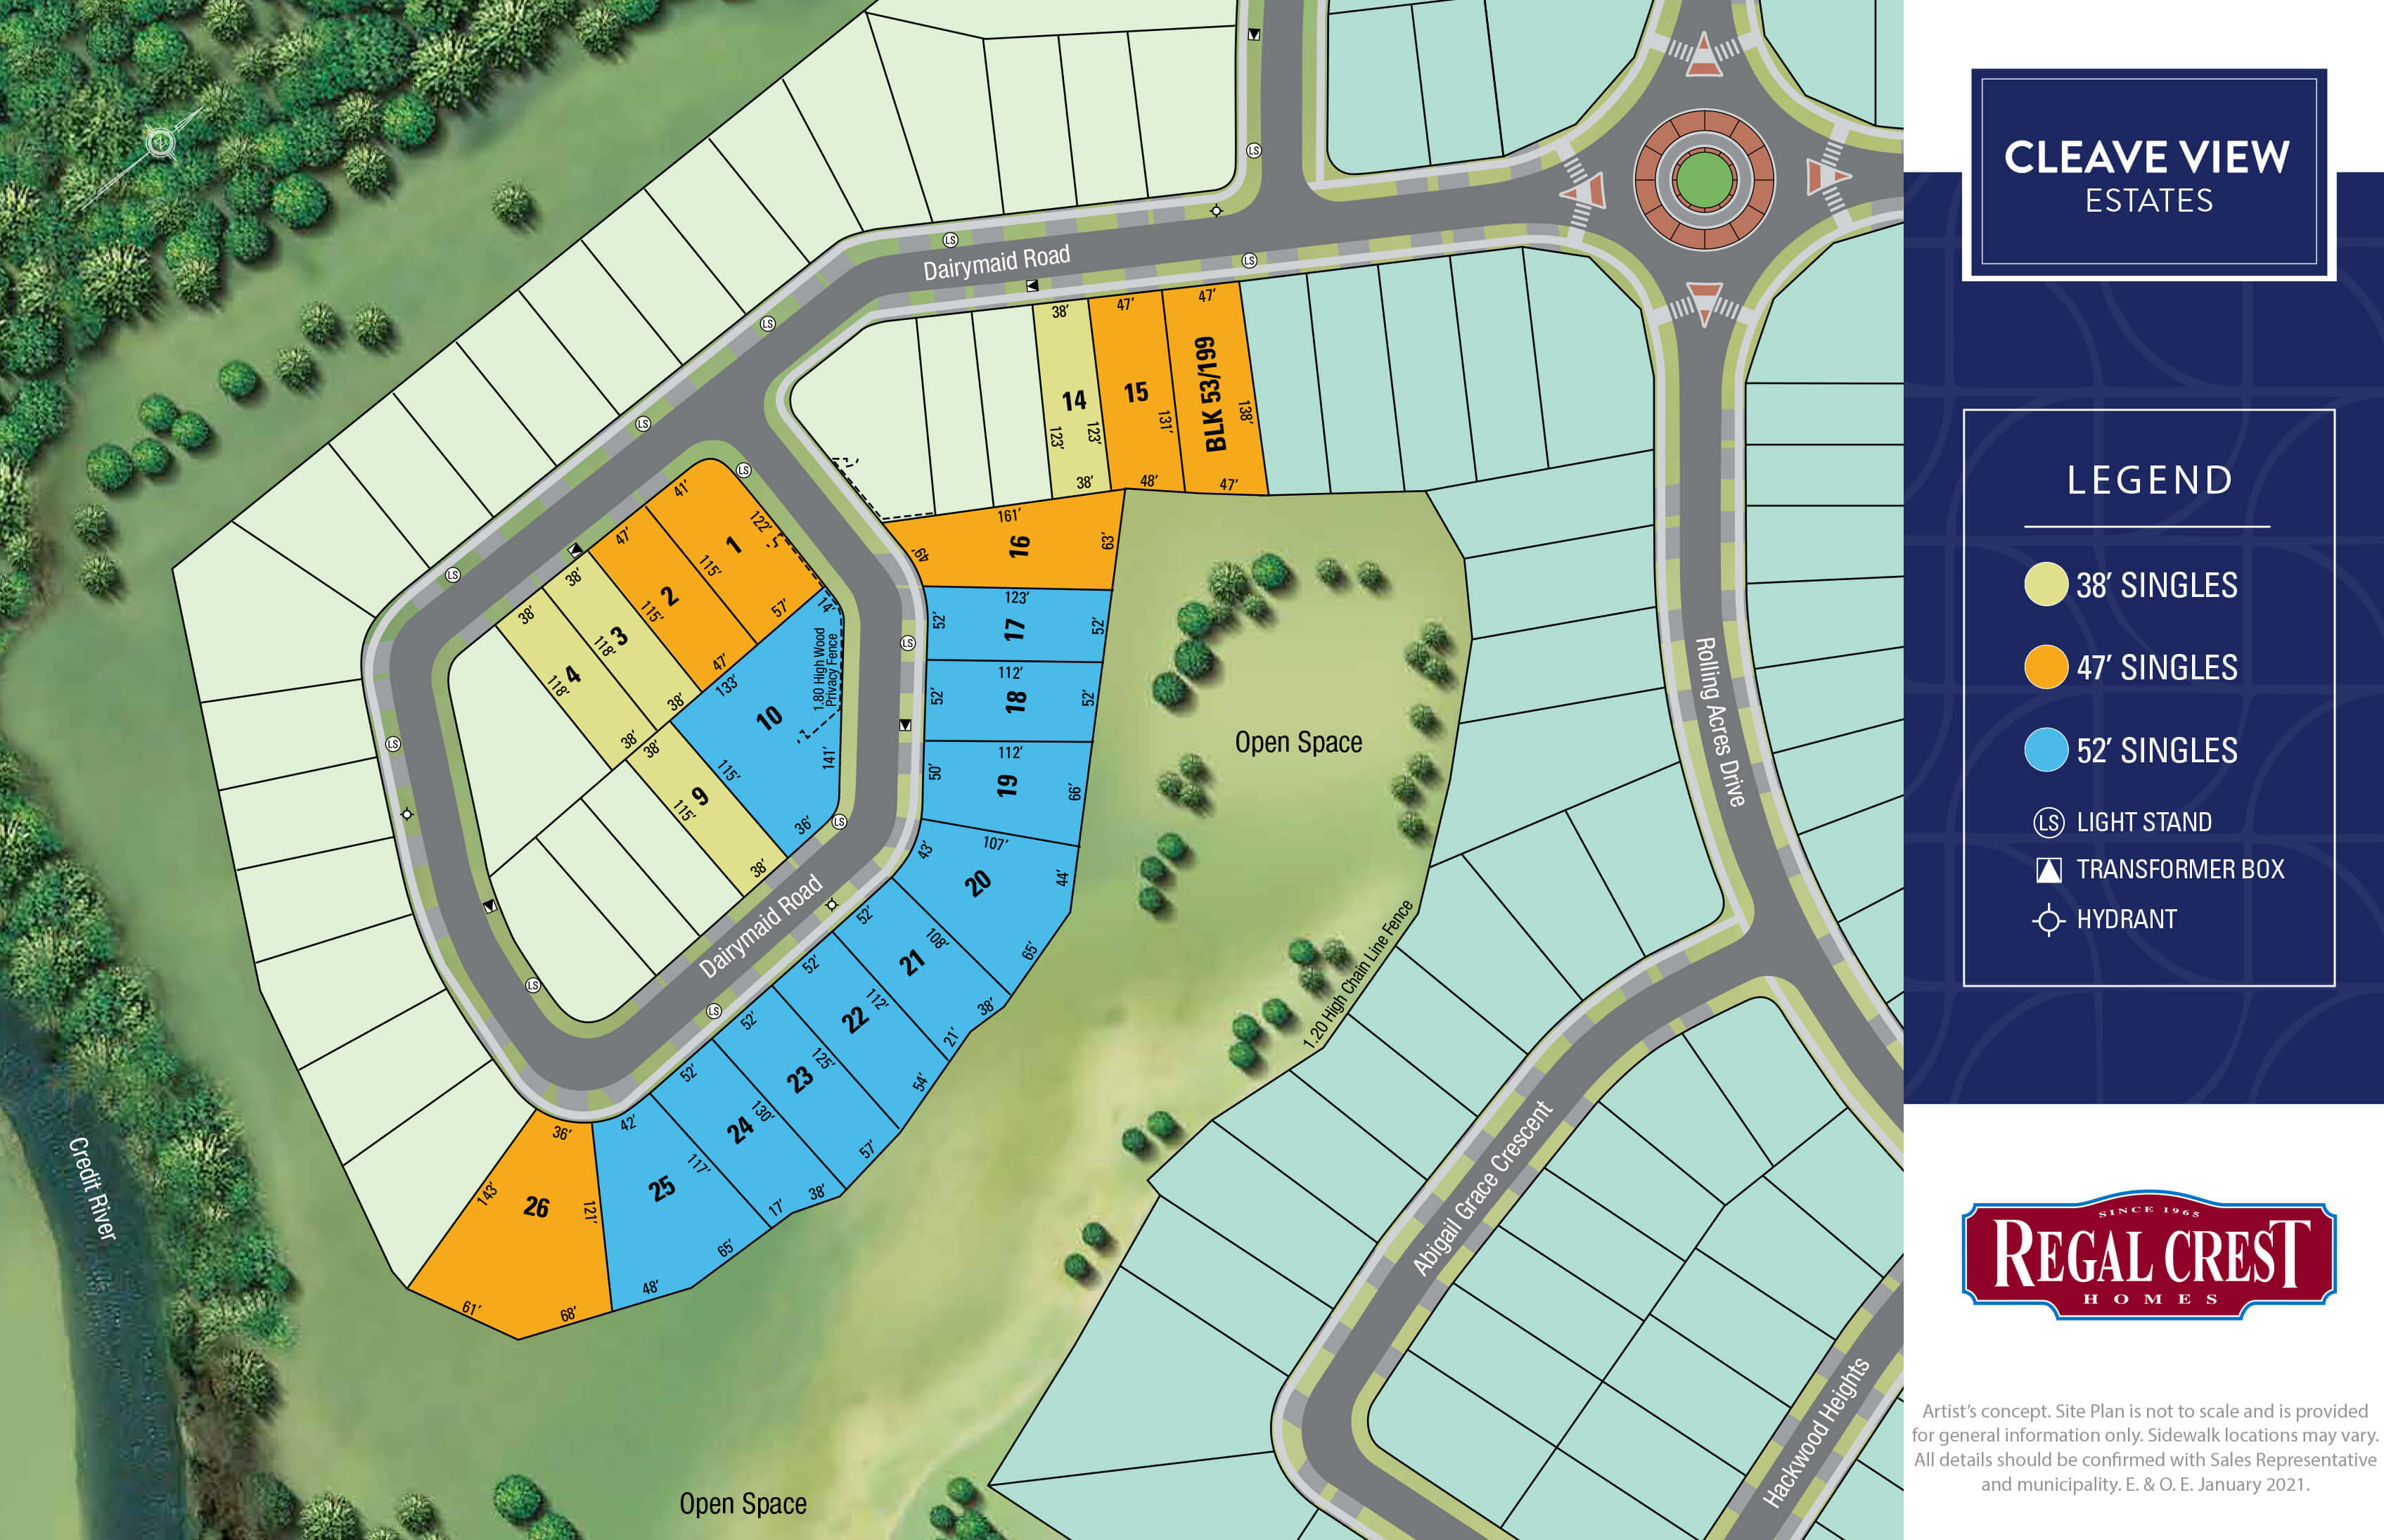 Cleave View Estates Site Plan